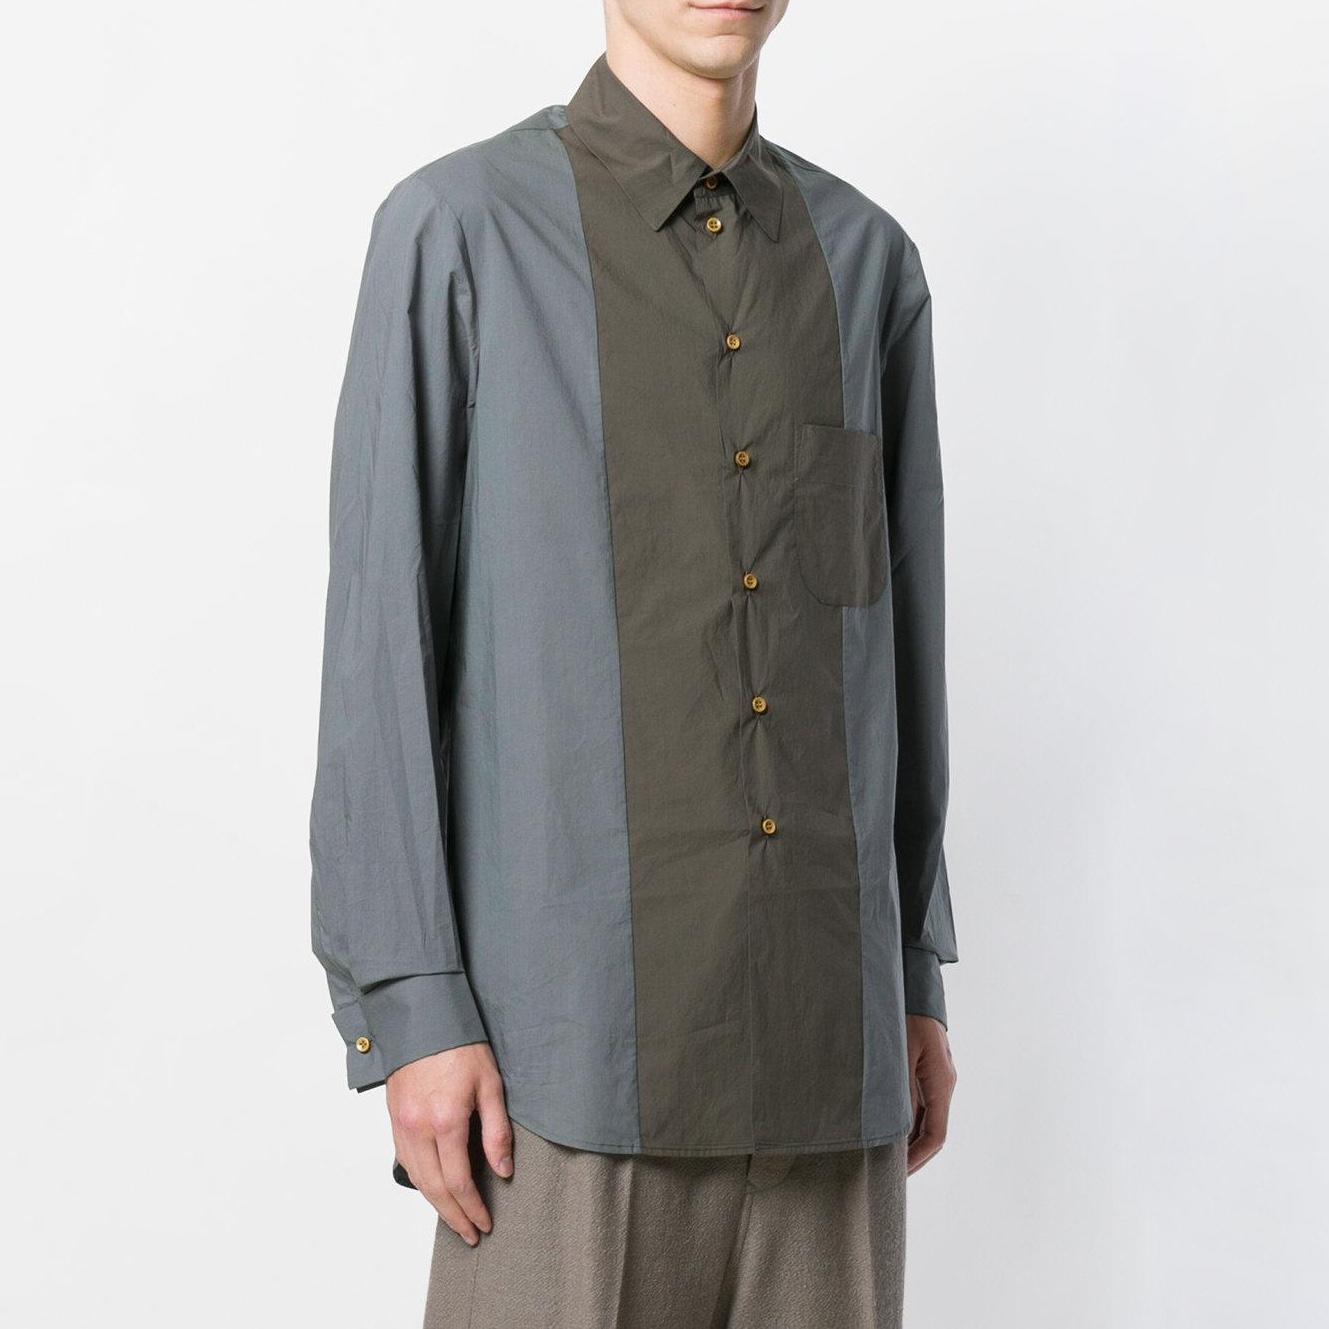 uma-wang-Green-Contrast-Fitted-Shirt (2).jpg